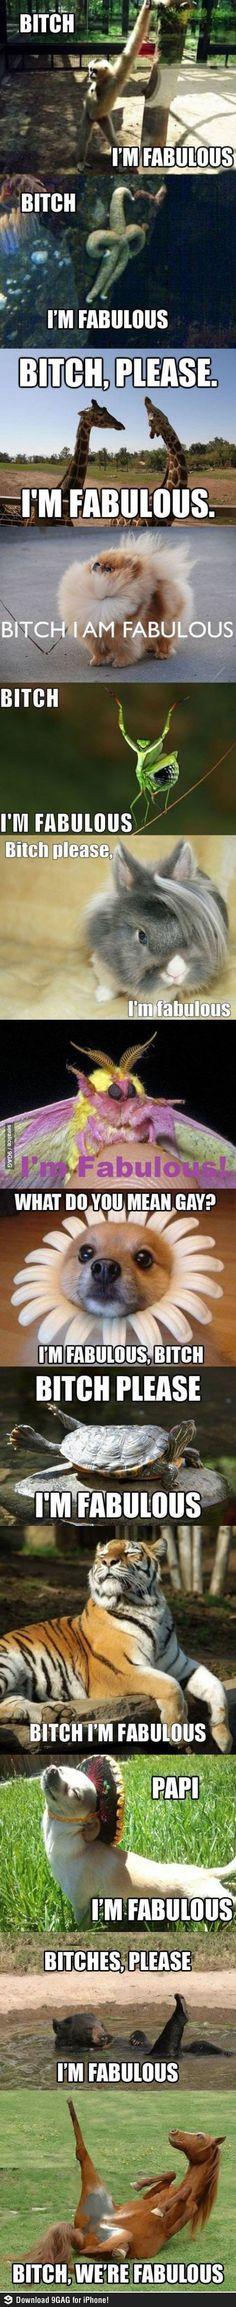 I´m fabulous animal edition